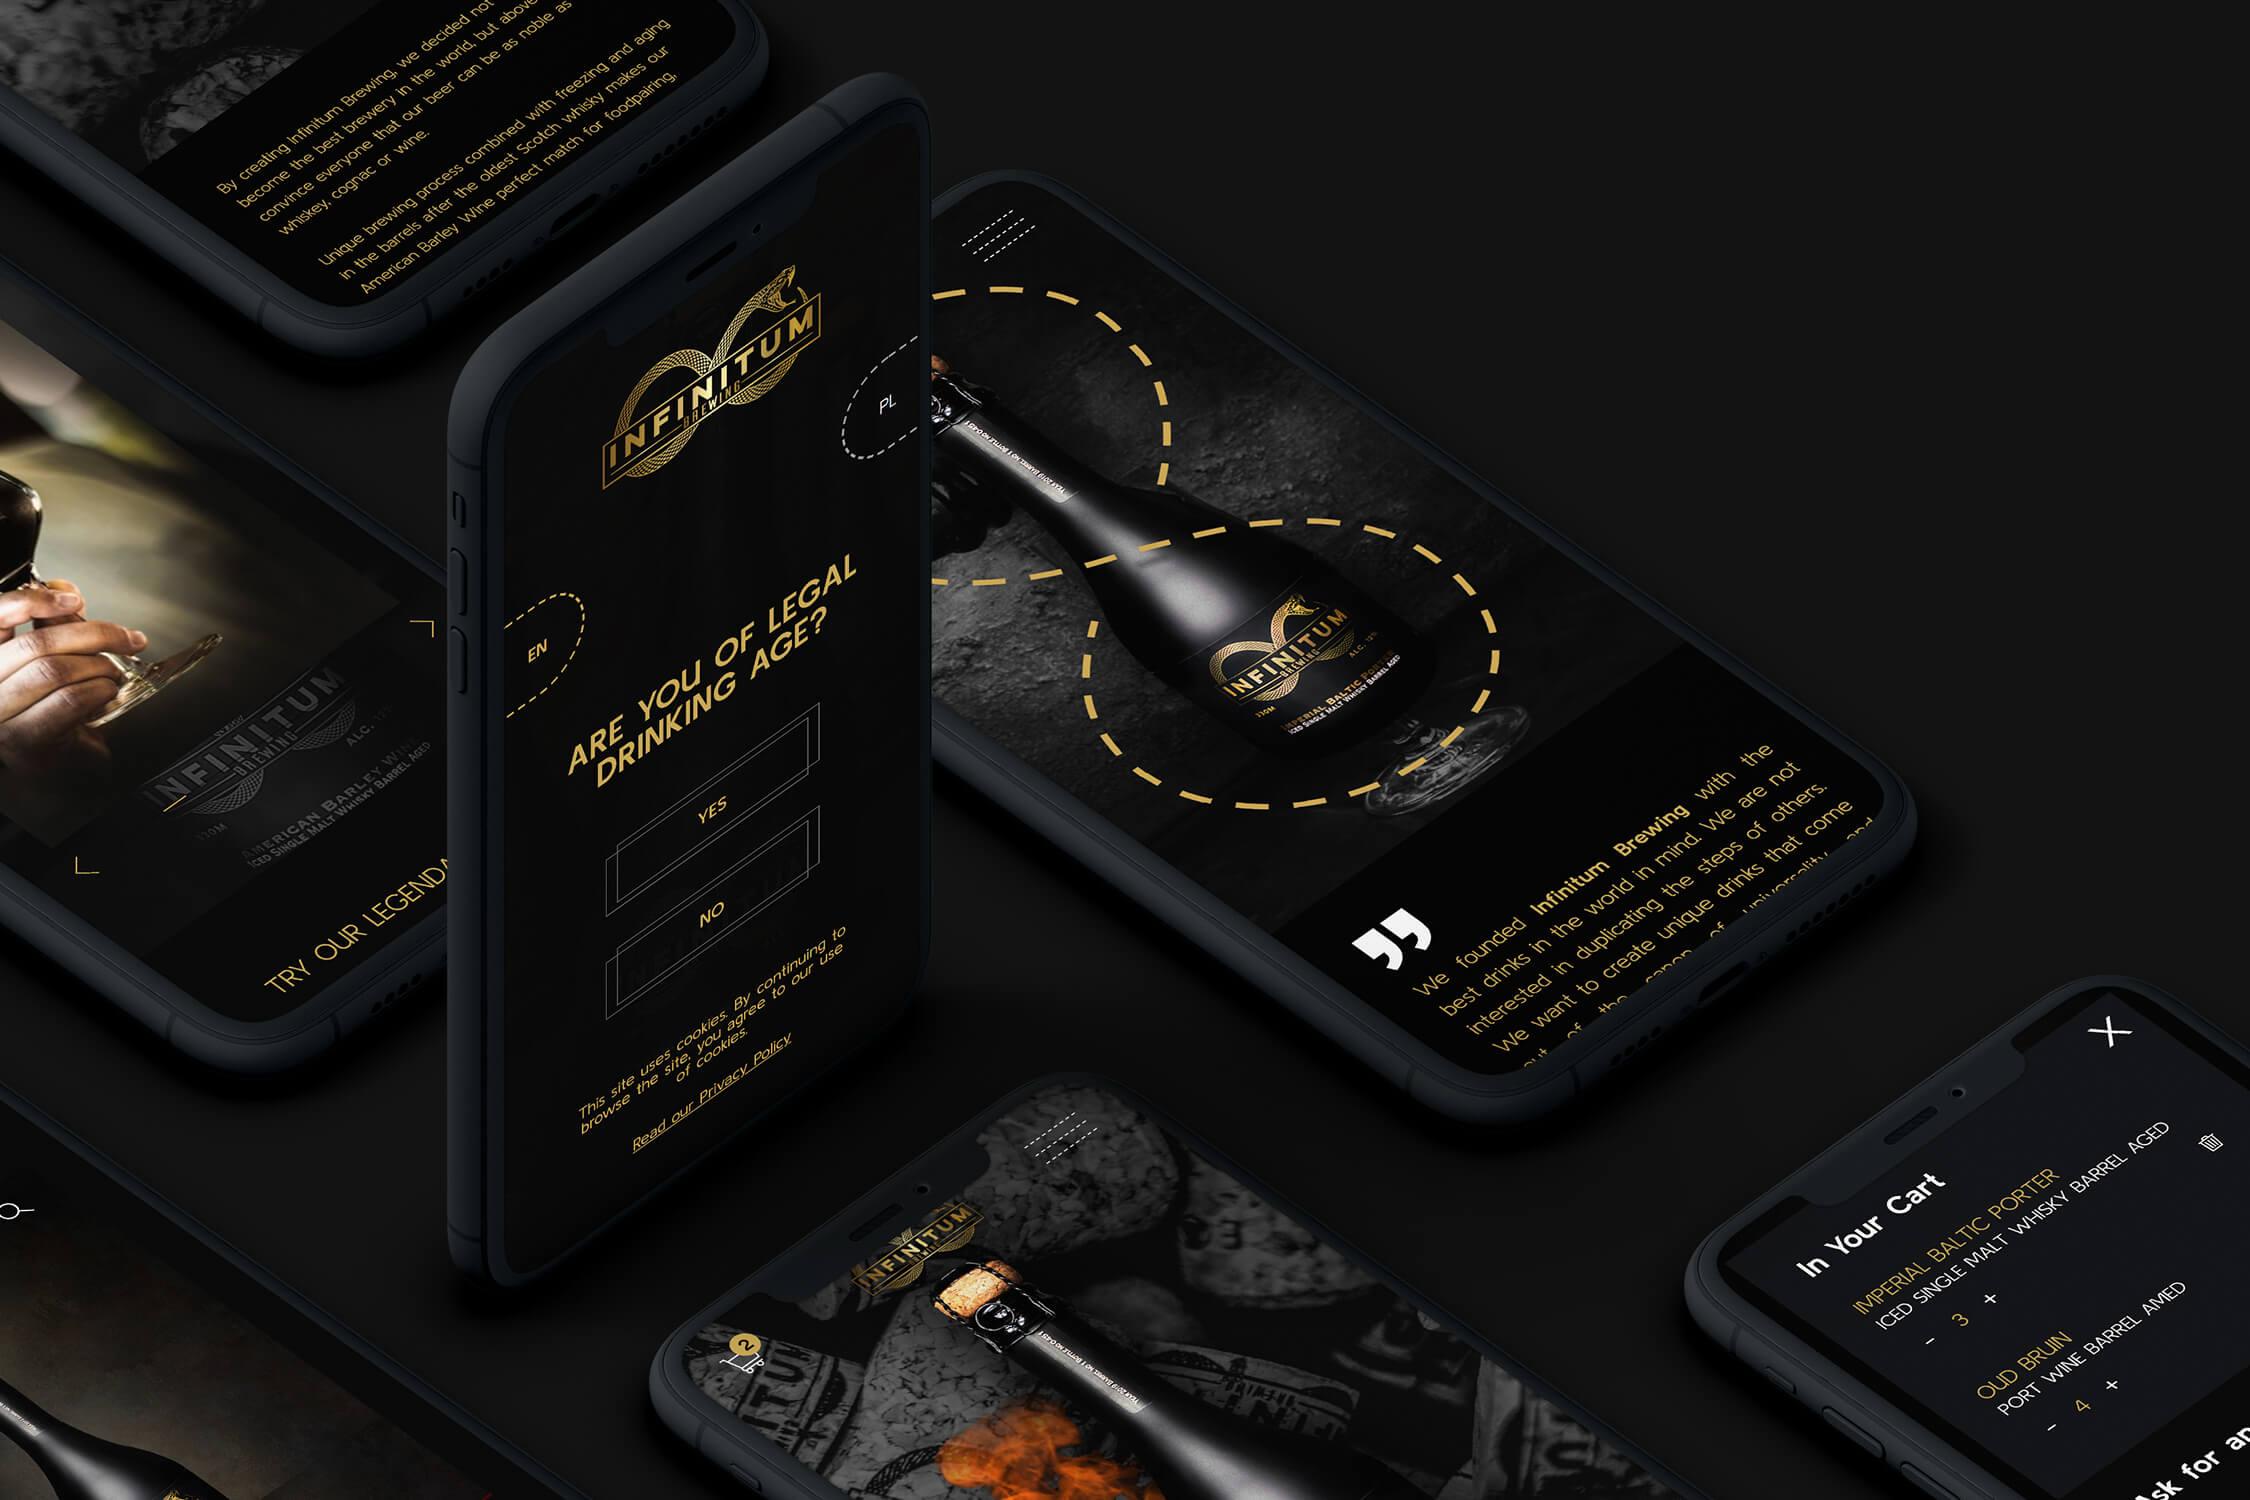 infinitum-brewing-seven-design-mobile-showcase-1